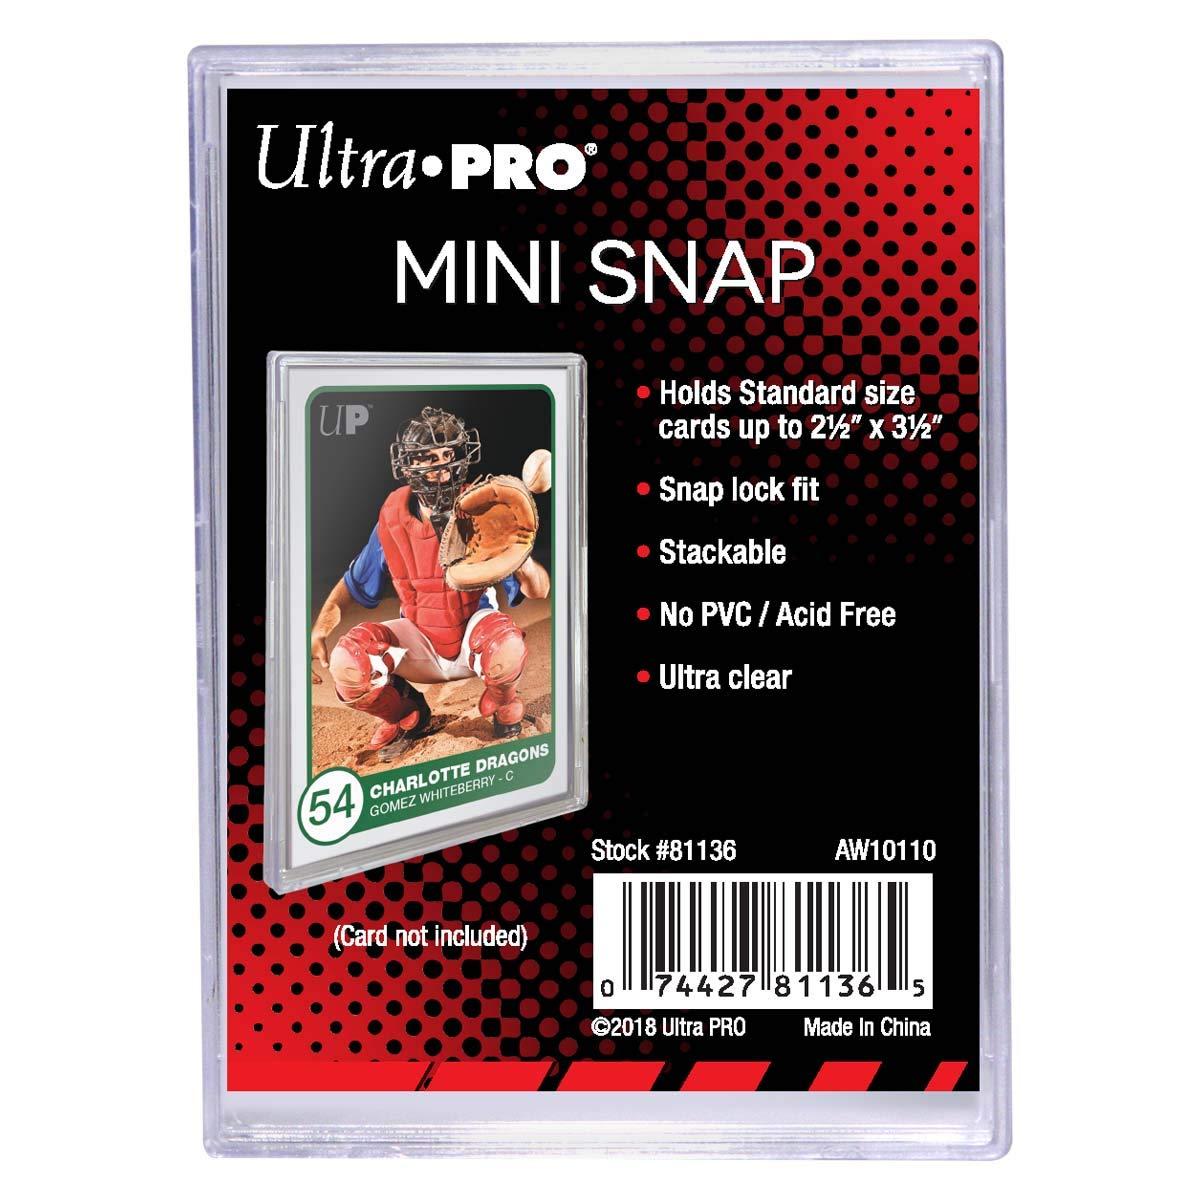 Bundle of 50 Mini Snaps Ultra Pro Mini Snap Card Holder #81136